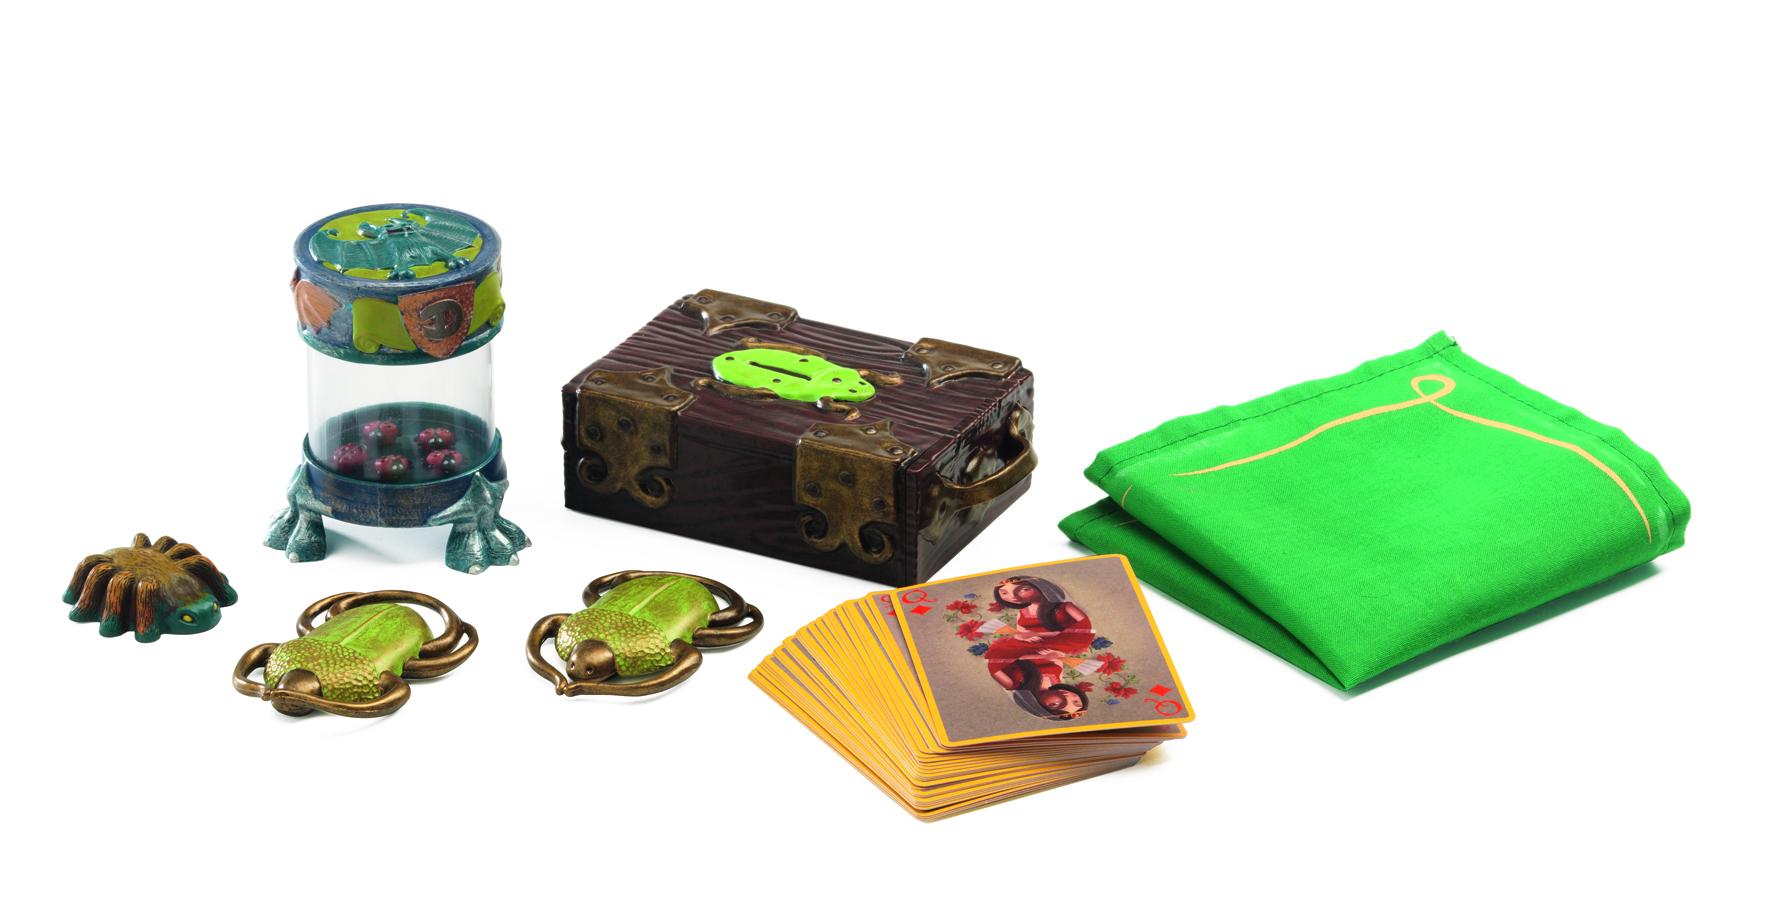 Djeco 9964 Zaubertrick-Set Malicious